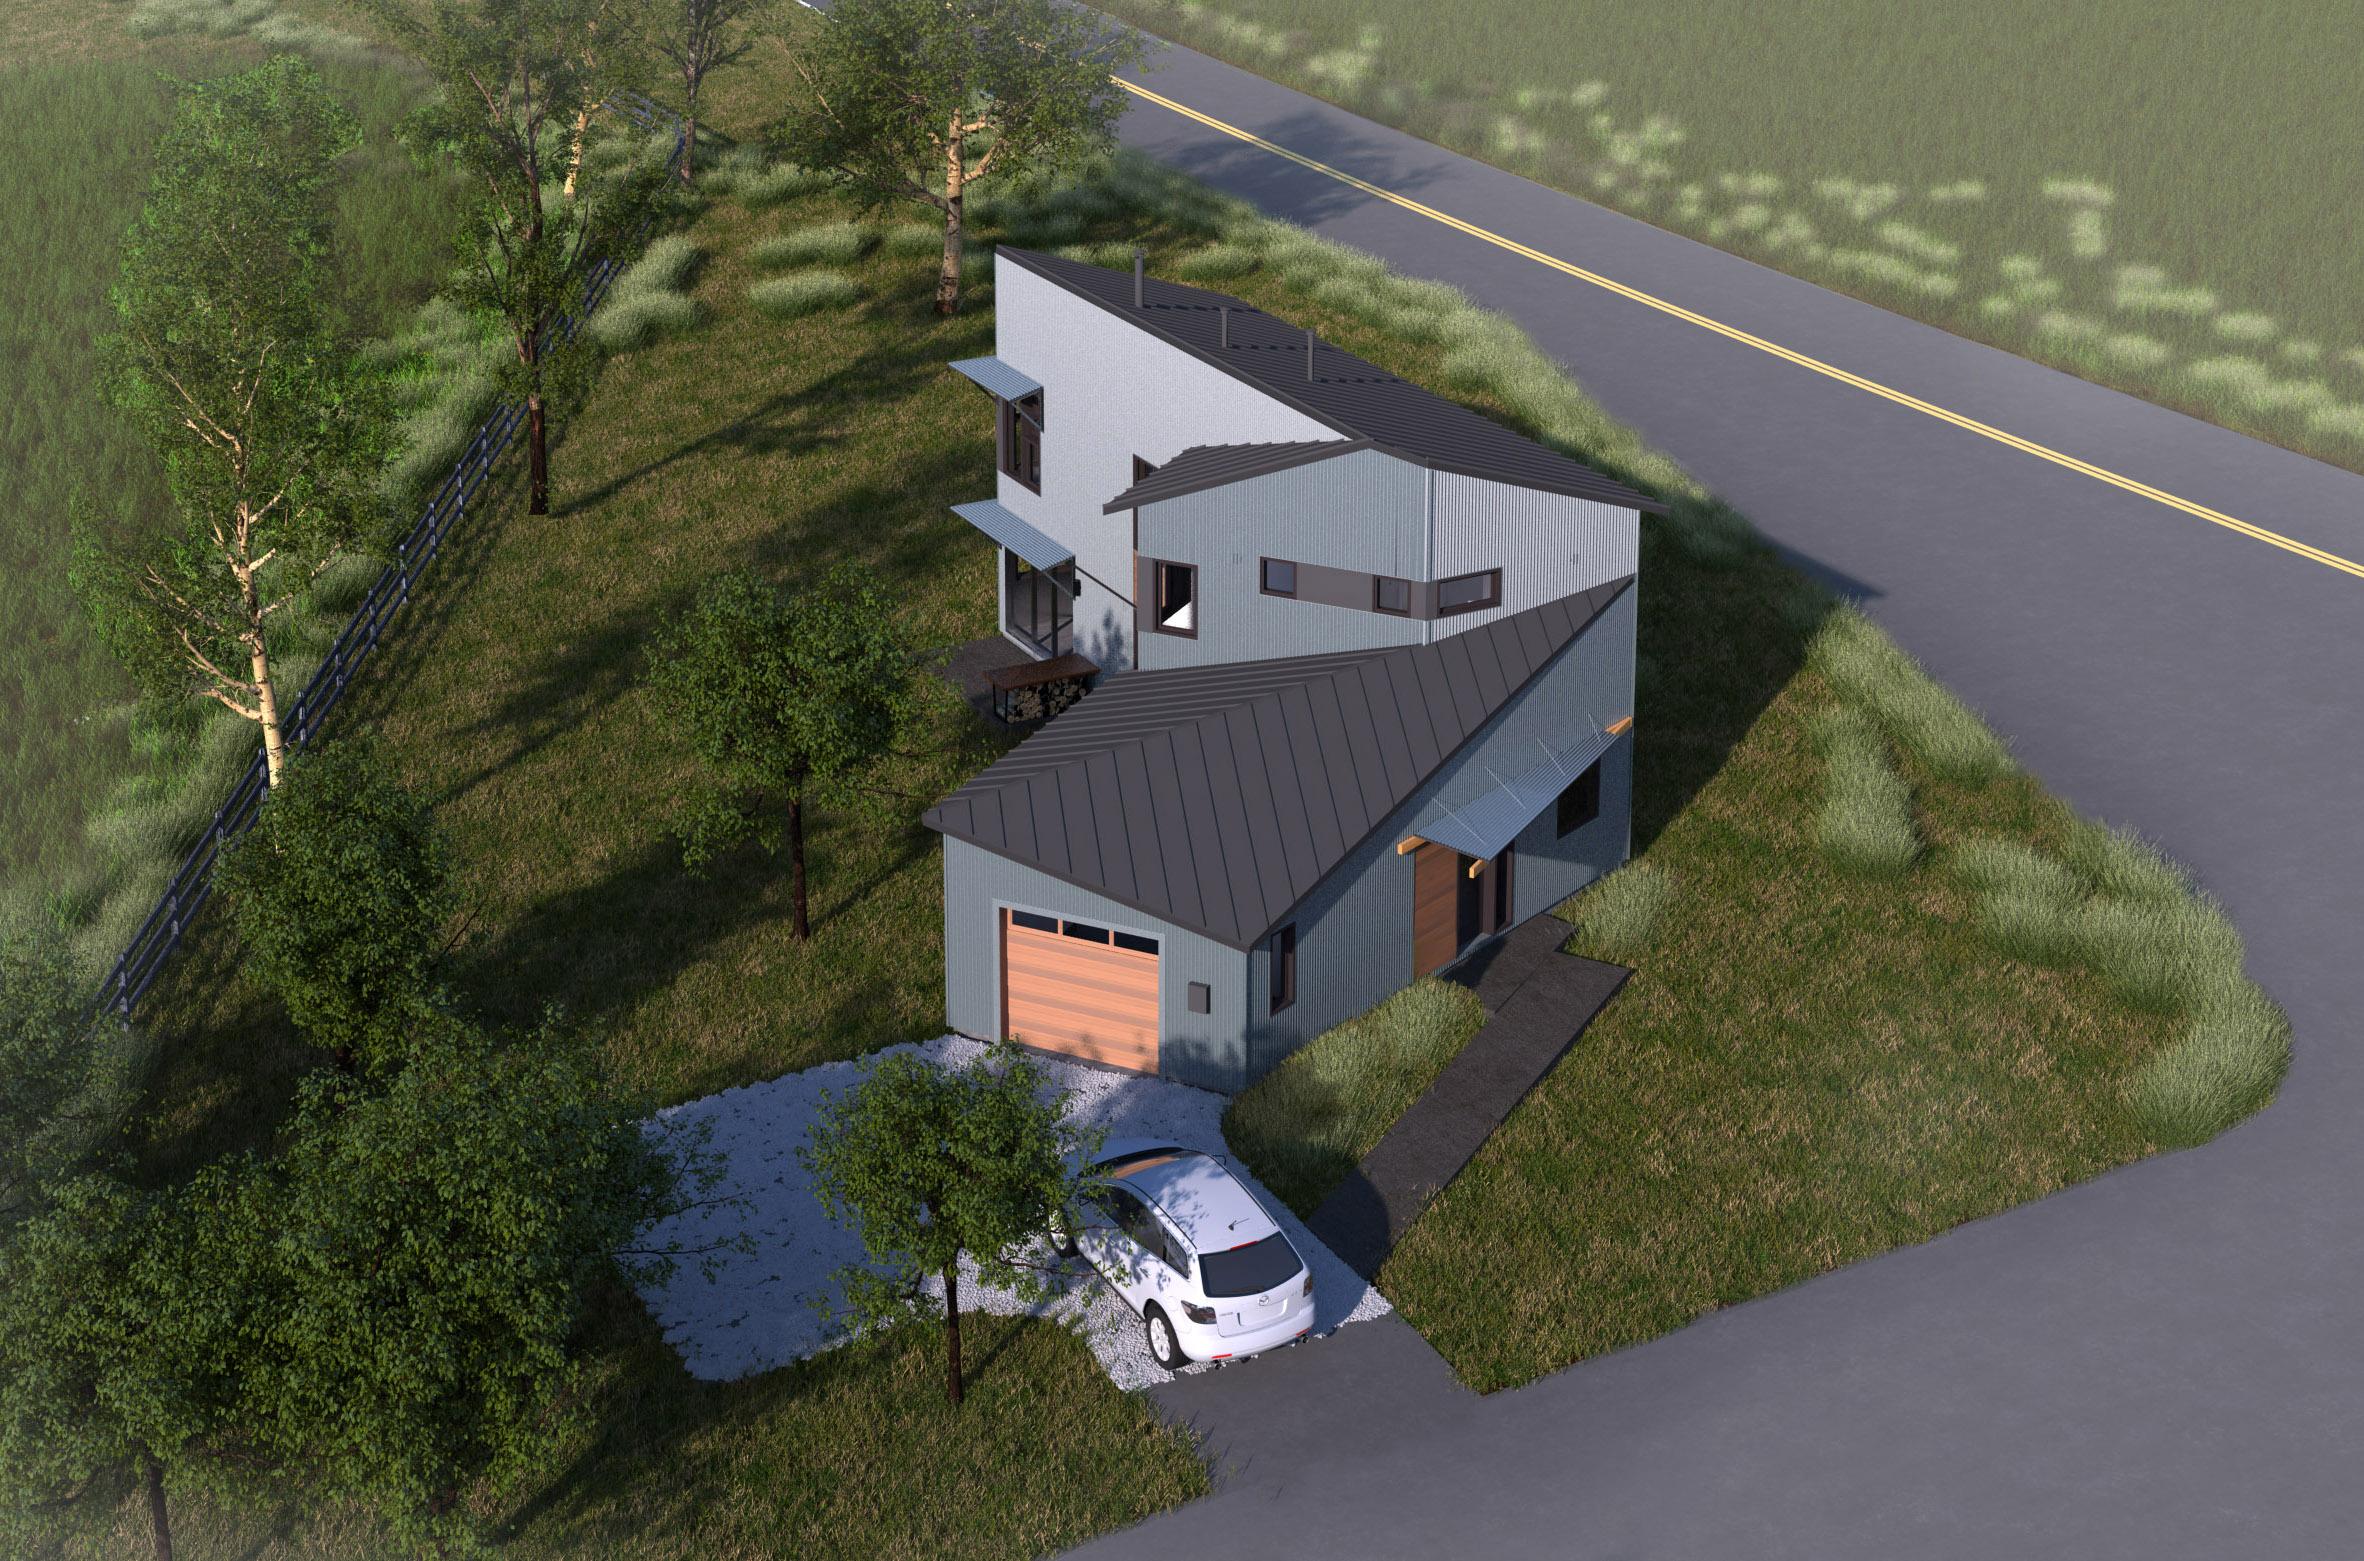 Sattley_house_aerial.jpg